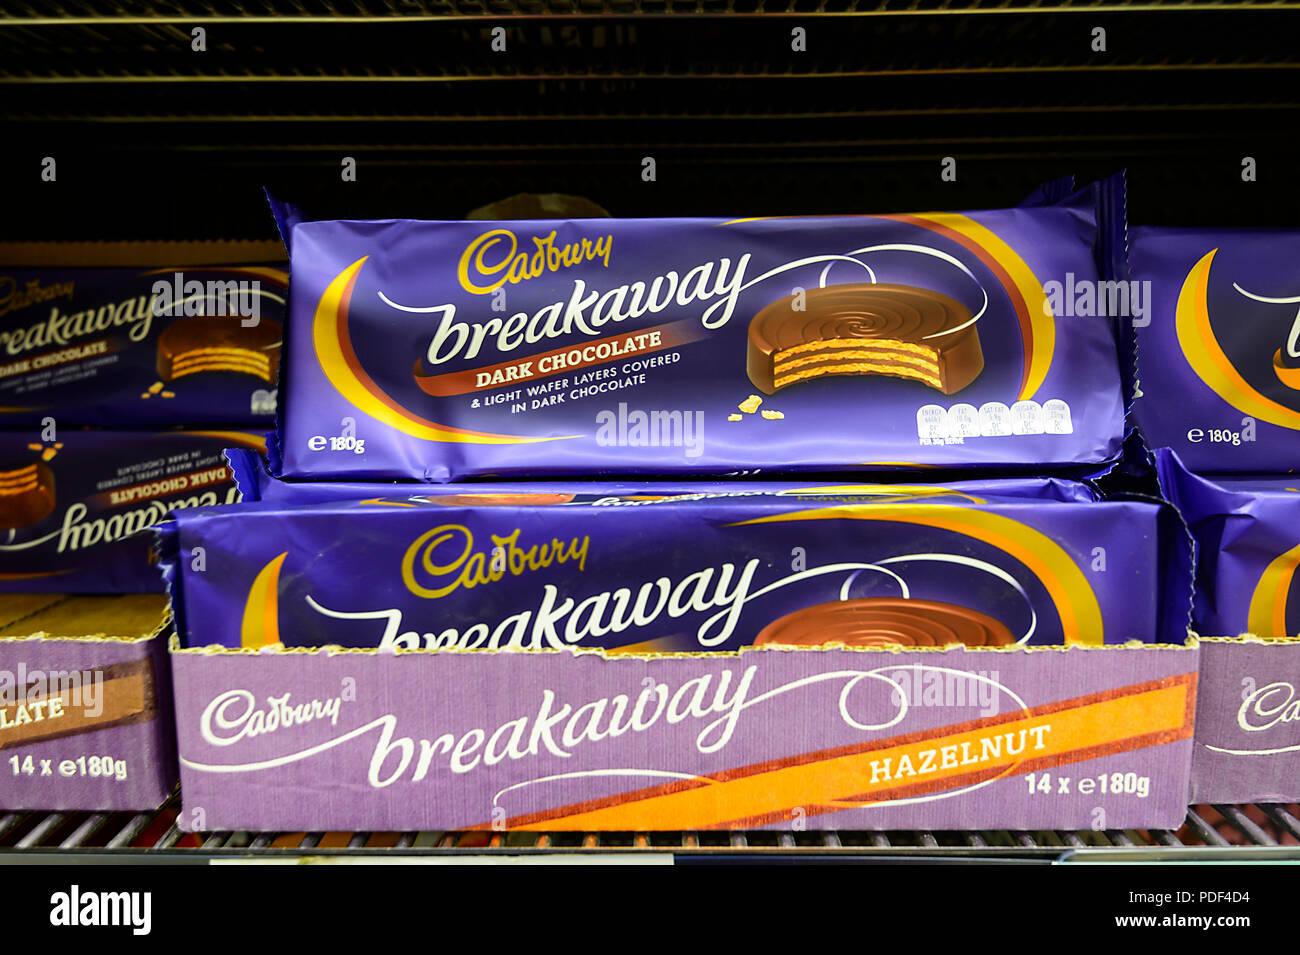 Bars of Cadbury breakaway chocolate on a shelf - Stock Image